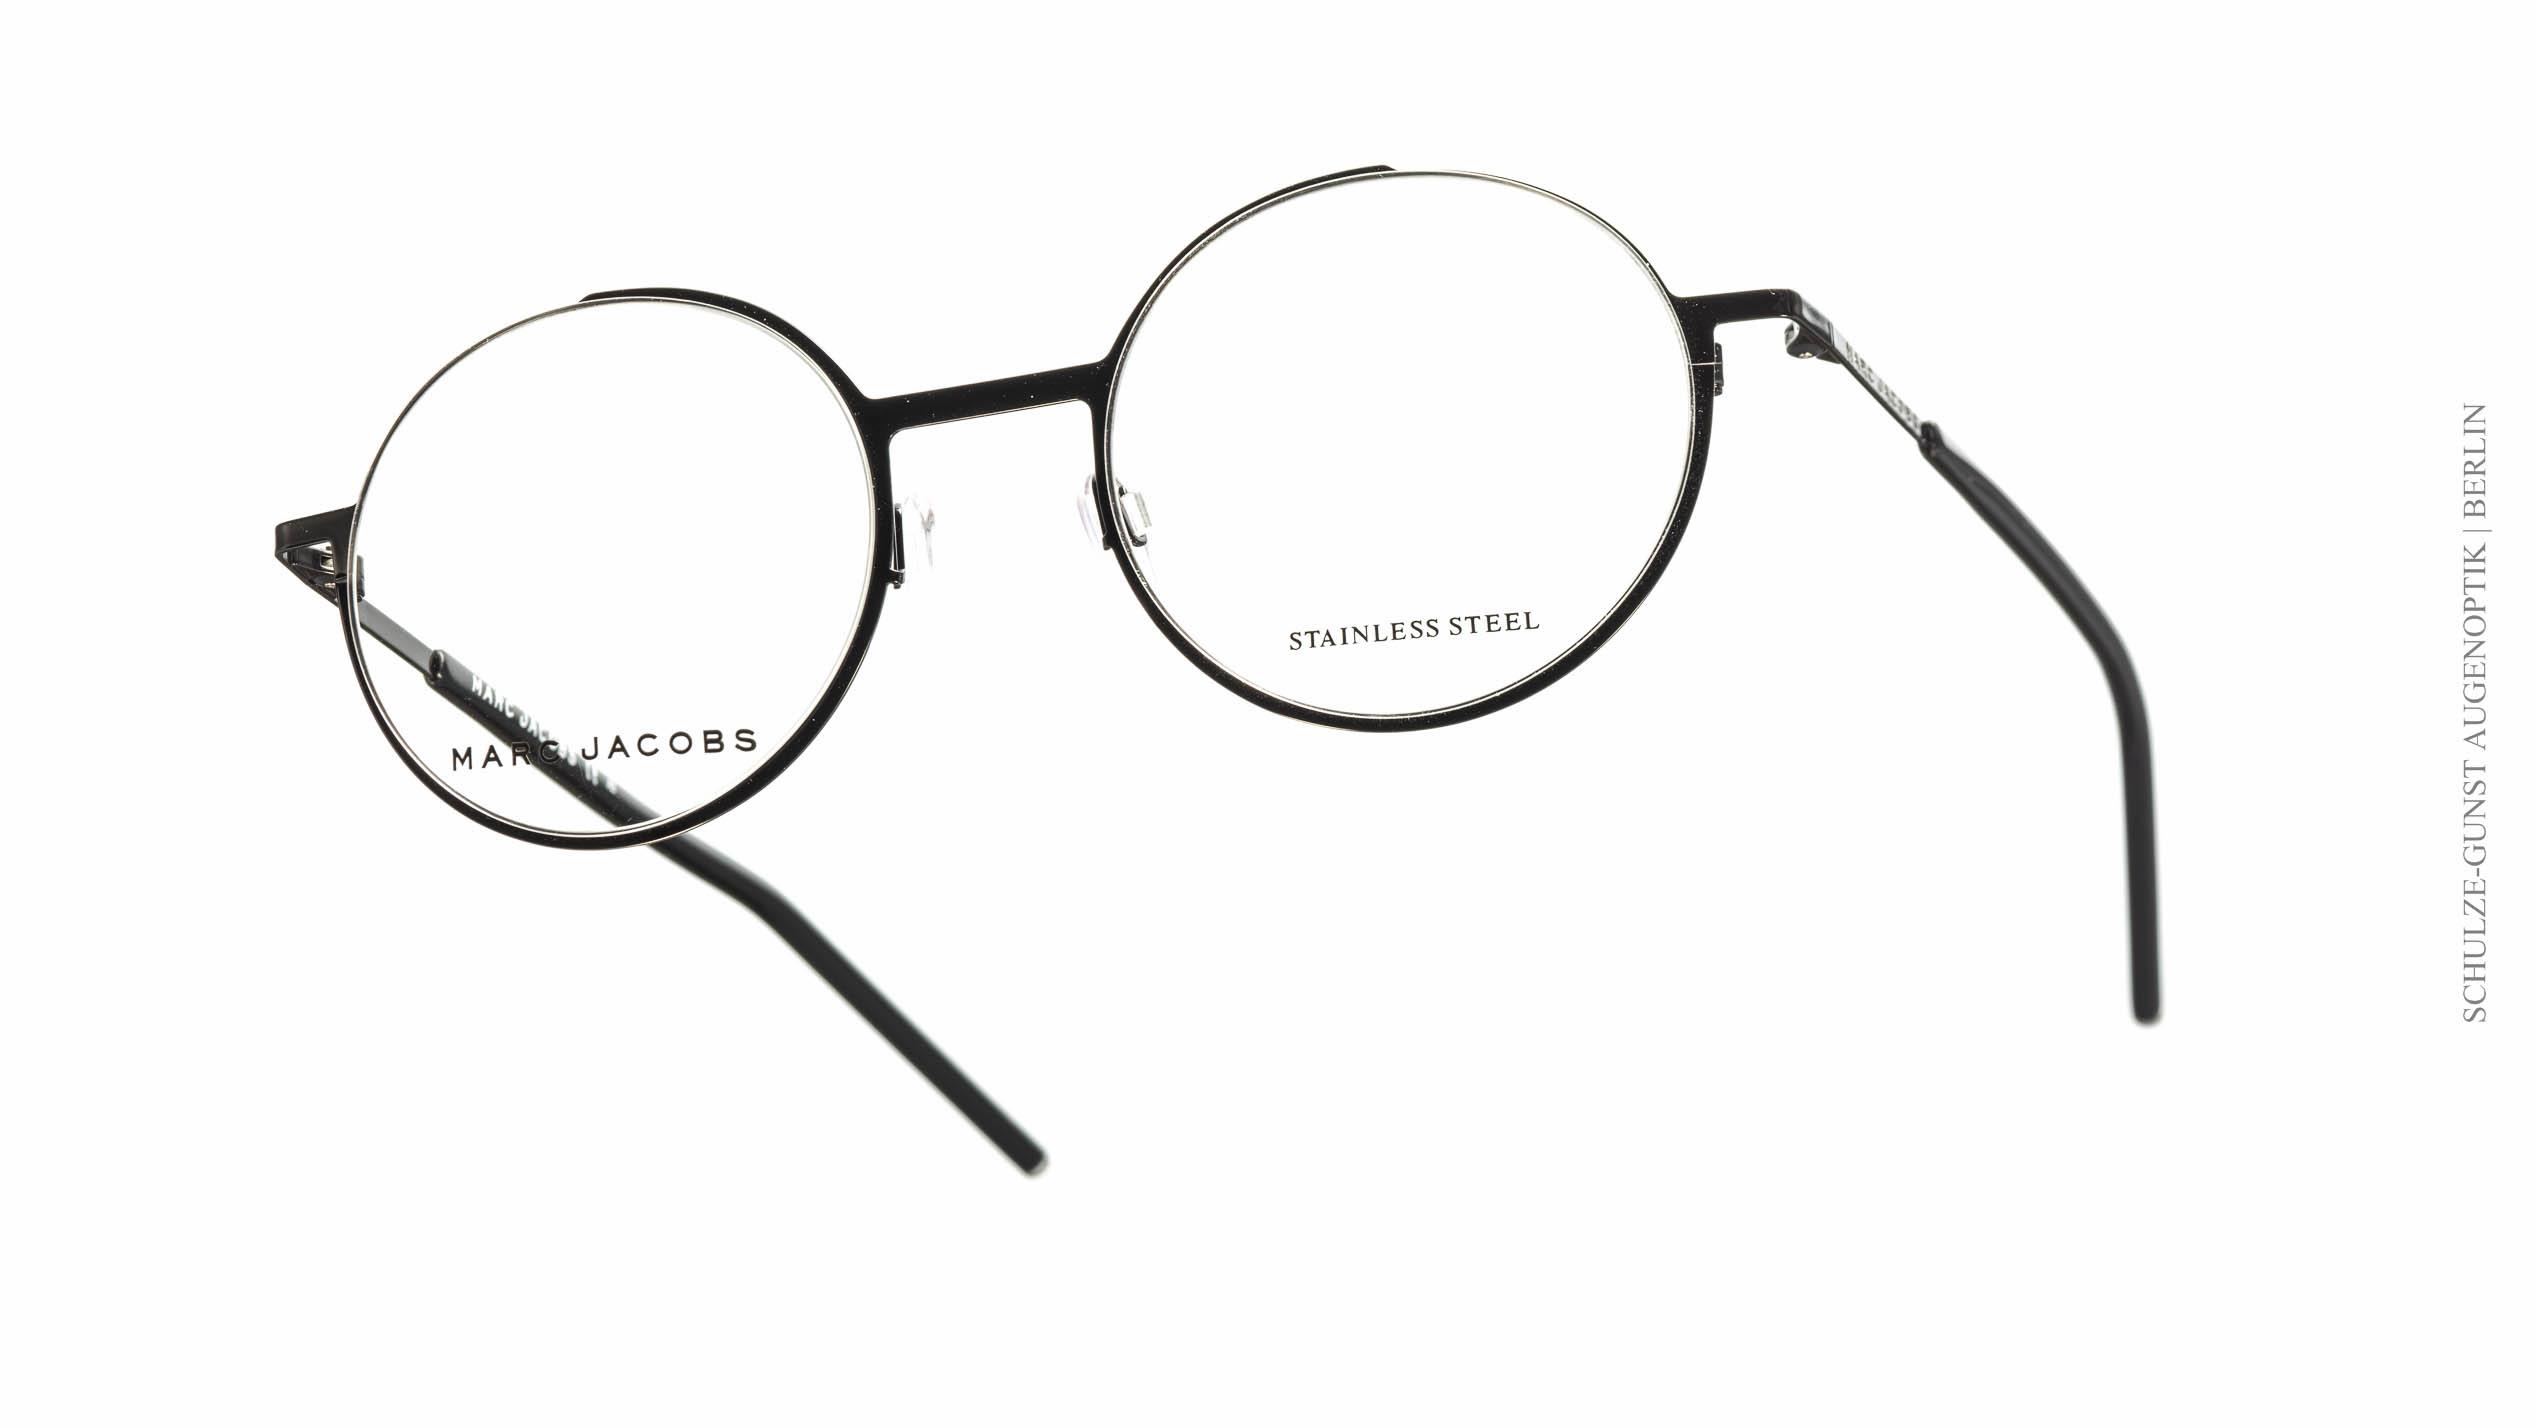 7853 – Marc Jacobs / Marc 39 - SCHULZE-GUNST Augenoptik seit 1894